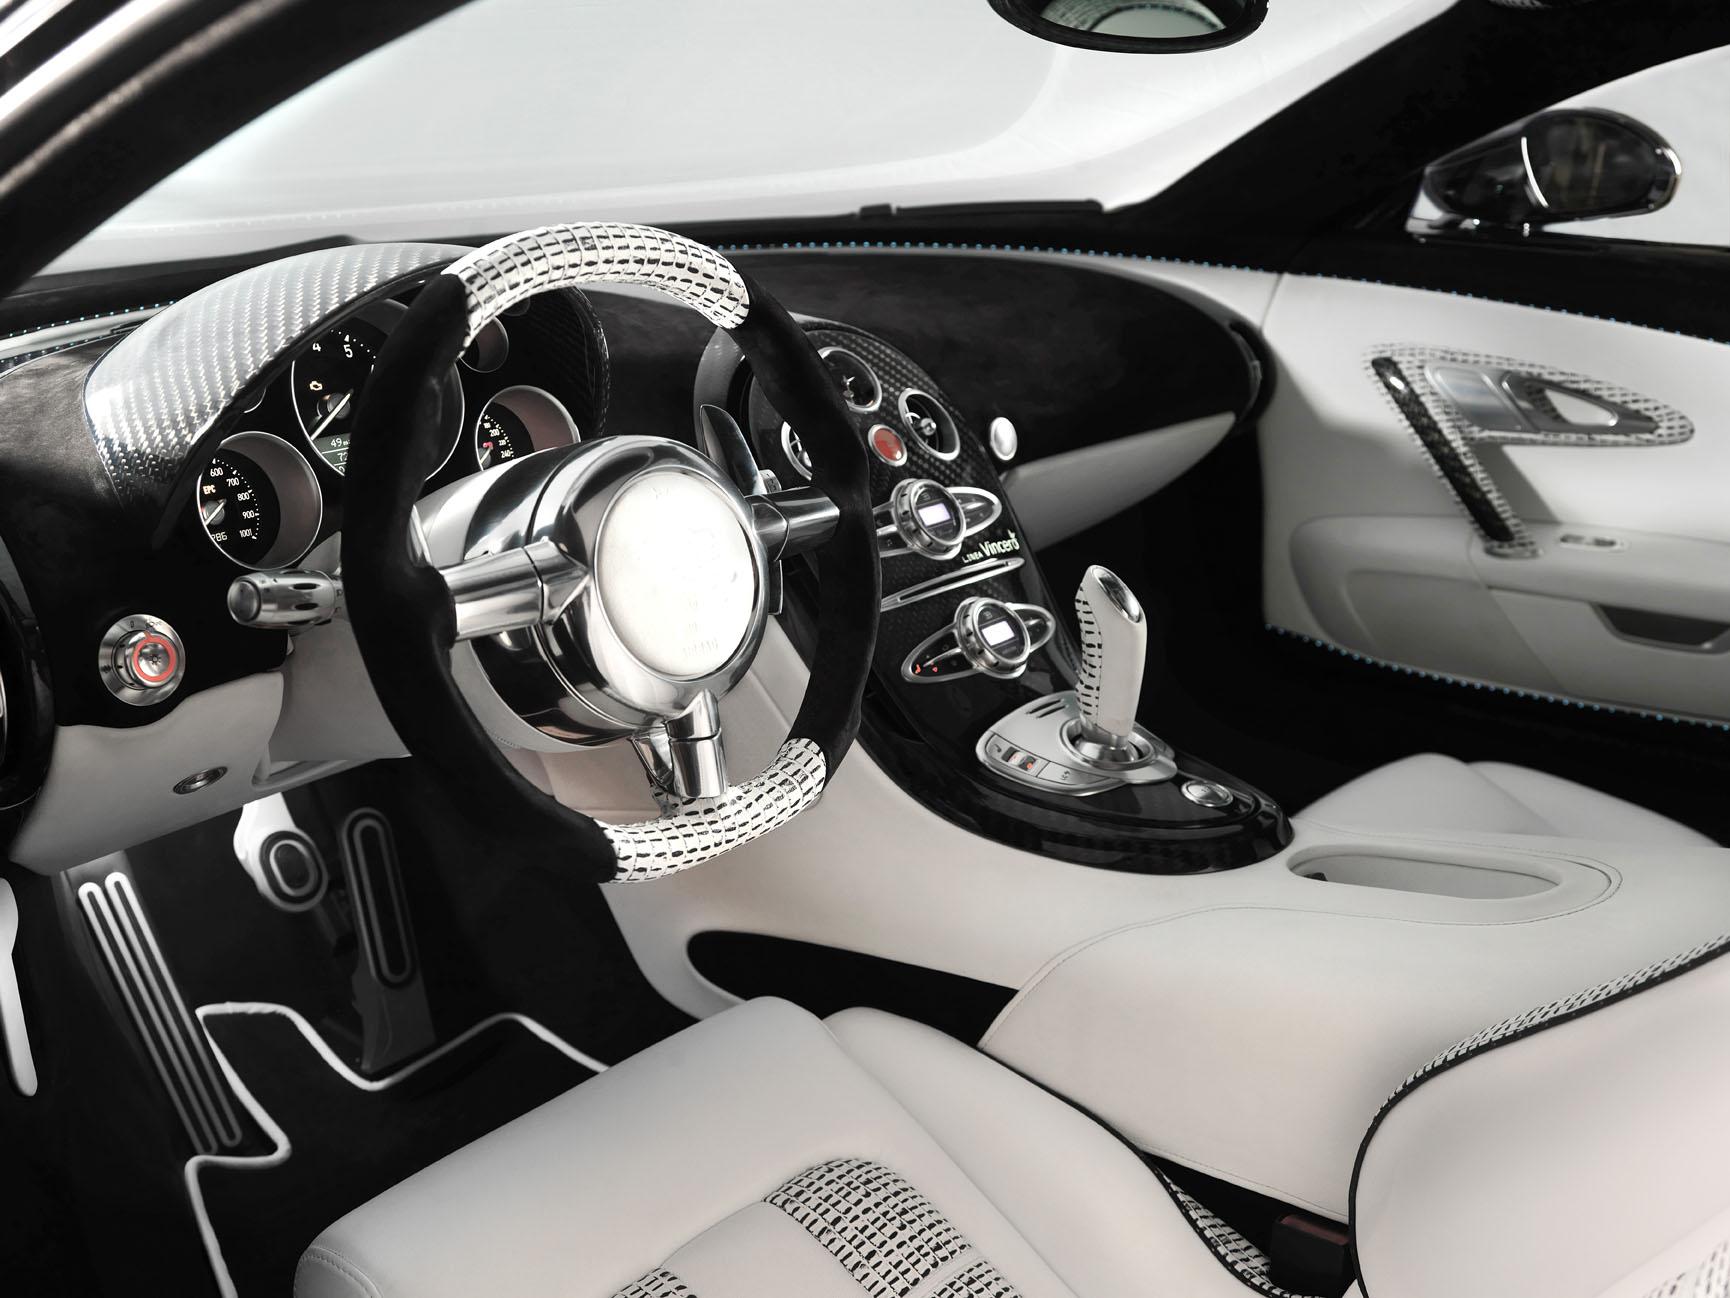 Presse] LINEA Vincerò – Mansory veredelt den Bugatti Veyron ...